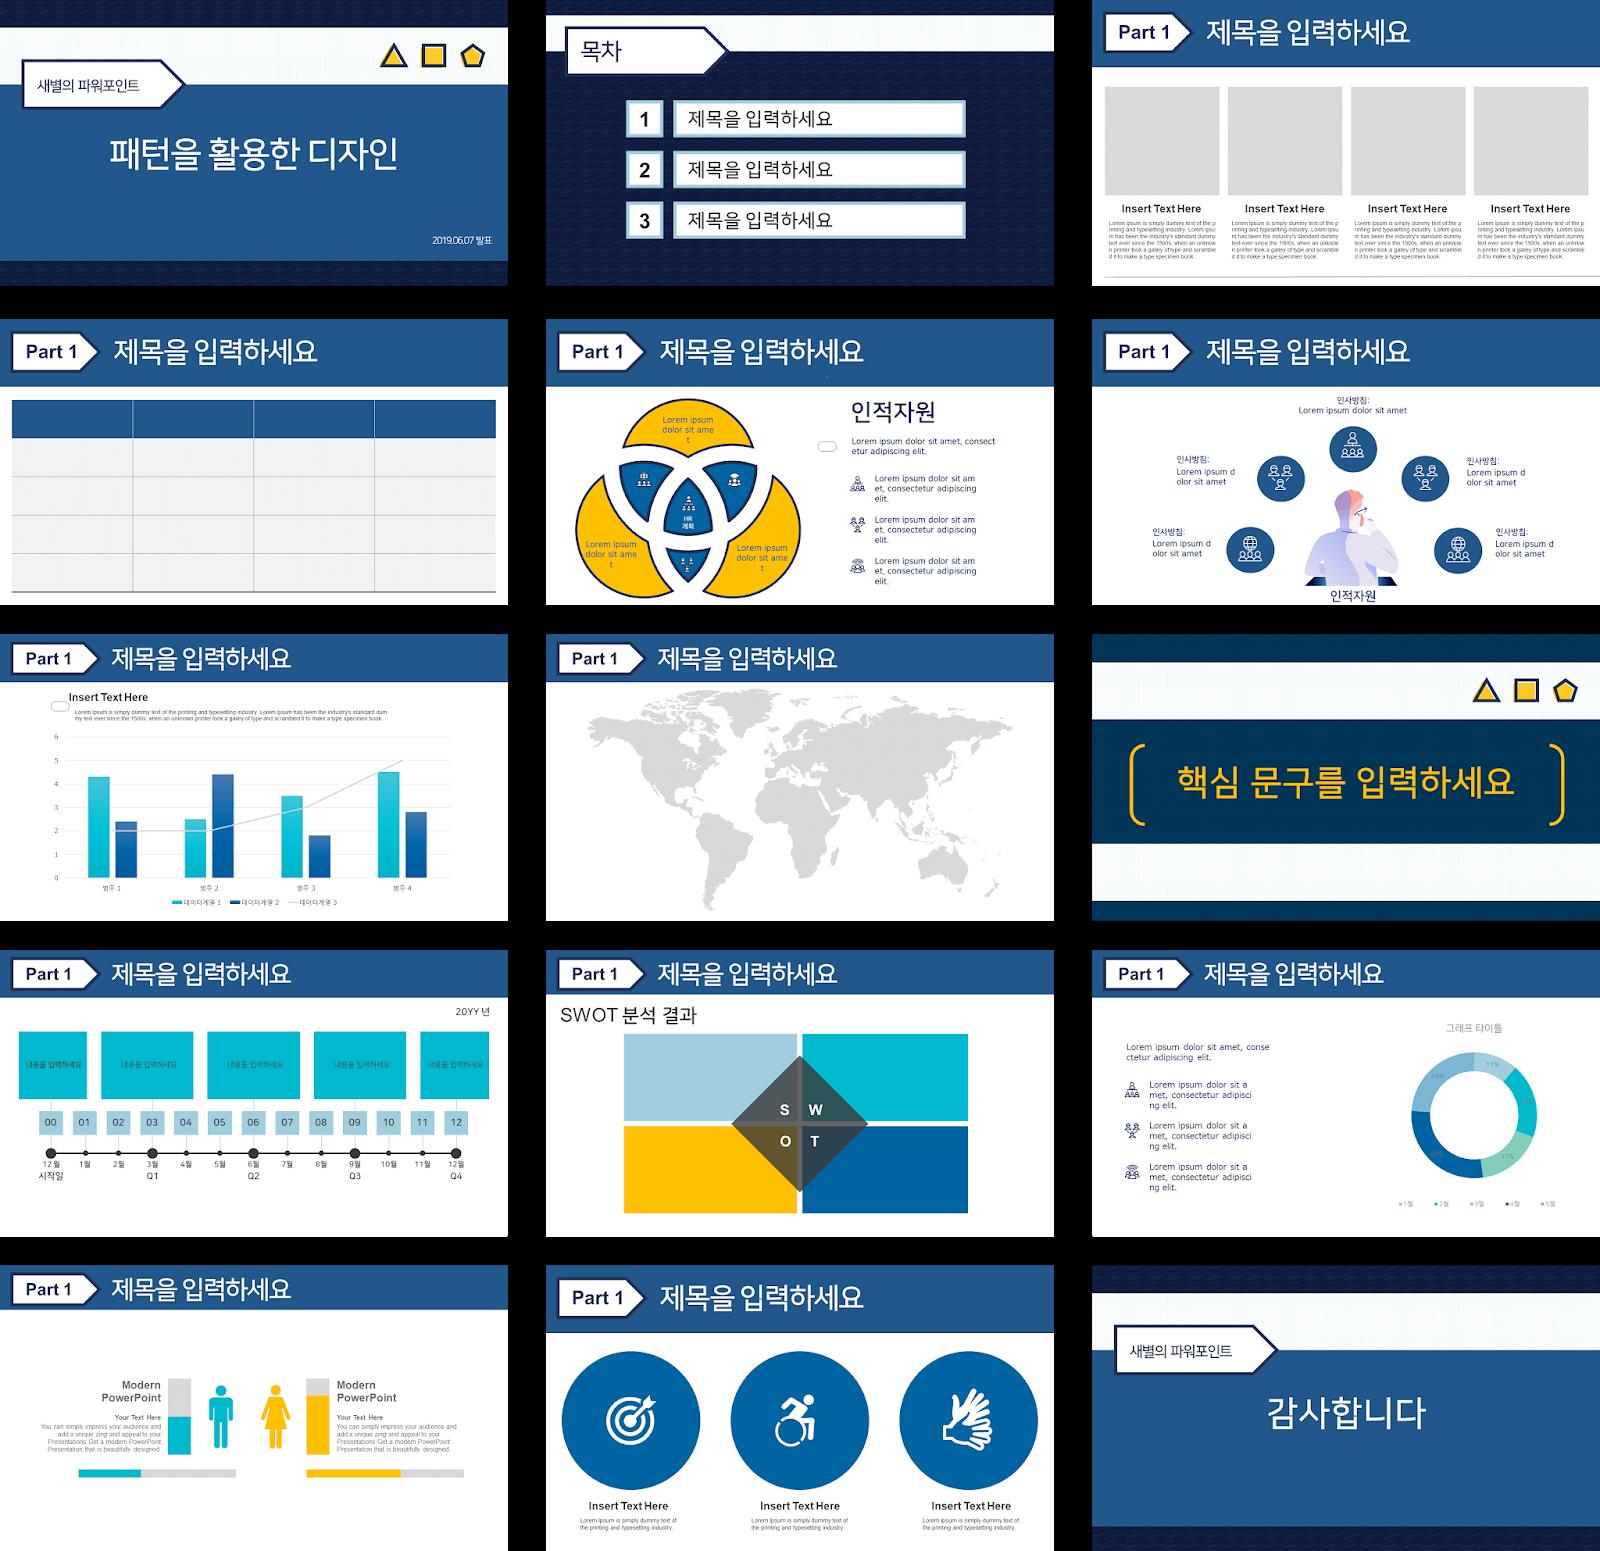 Free Microsoft Powerpoint Templates: [Free PowerPoint Template Download] 패턴을 이용한 깔끔한 파란색 PPT